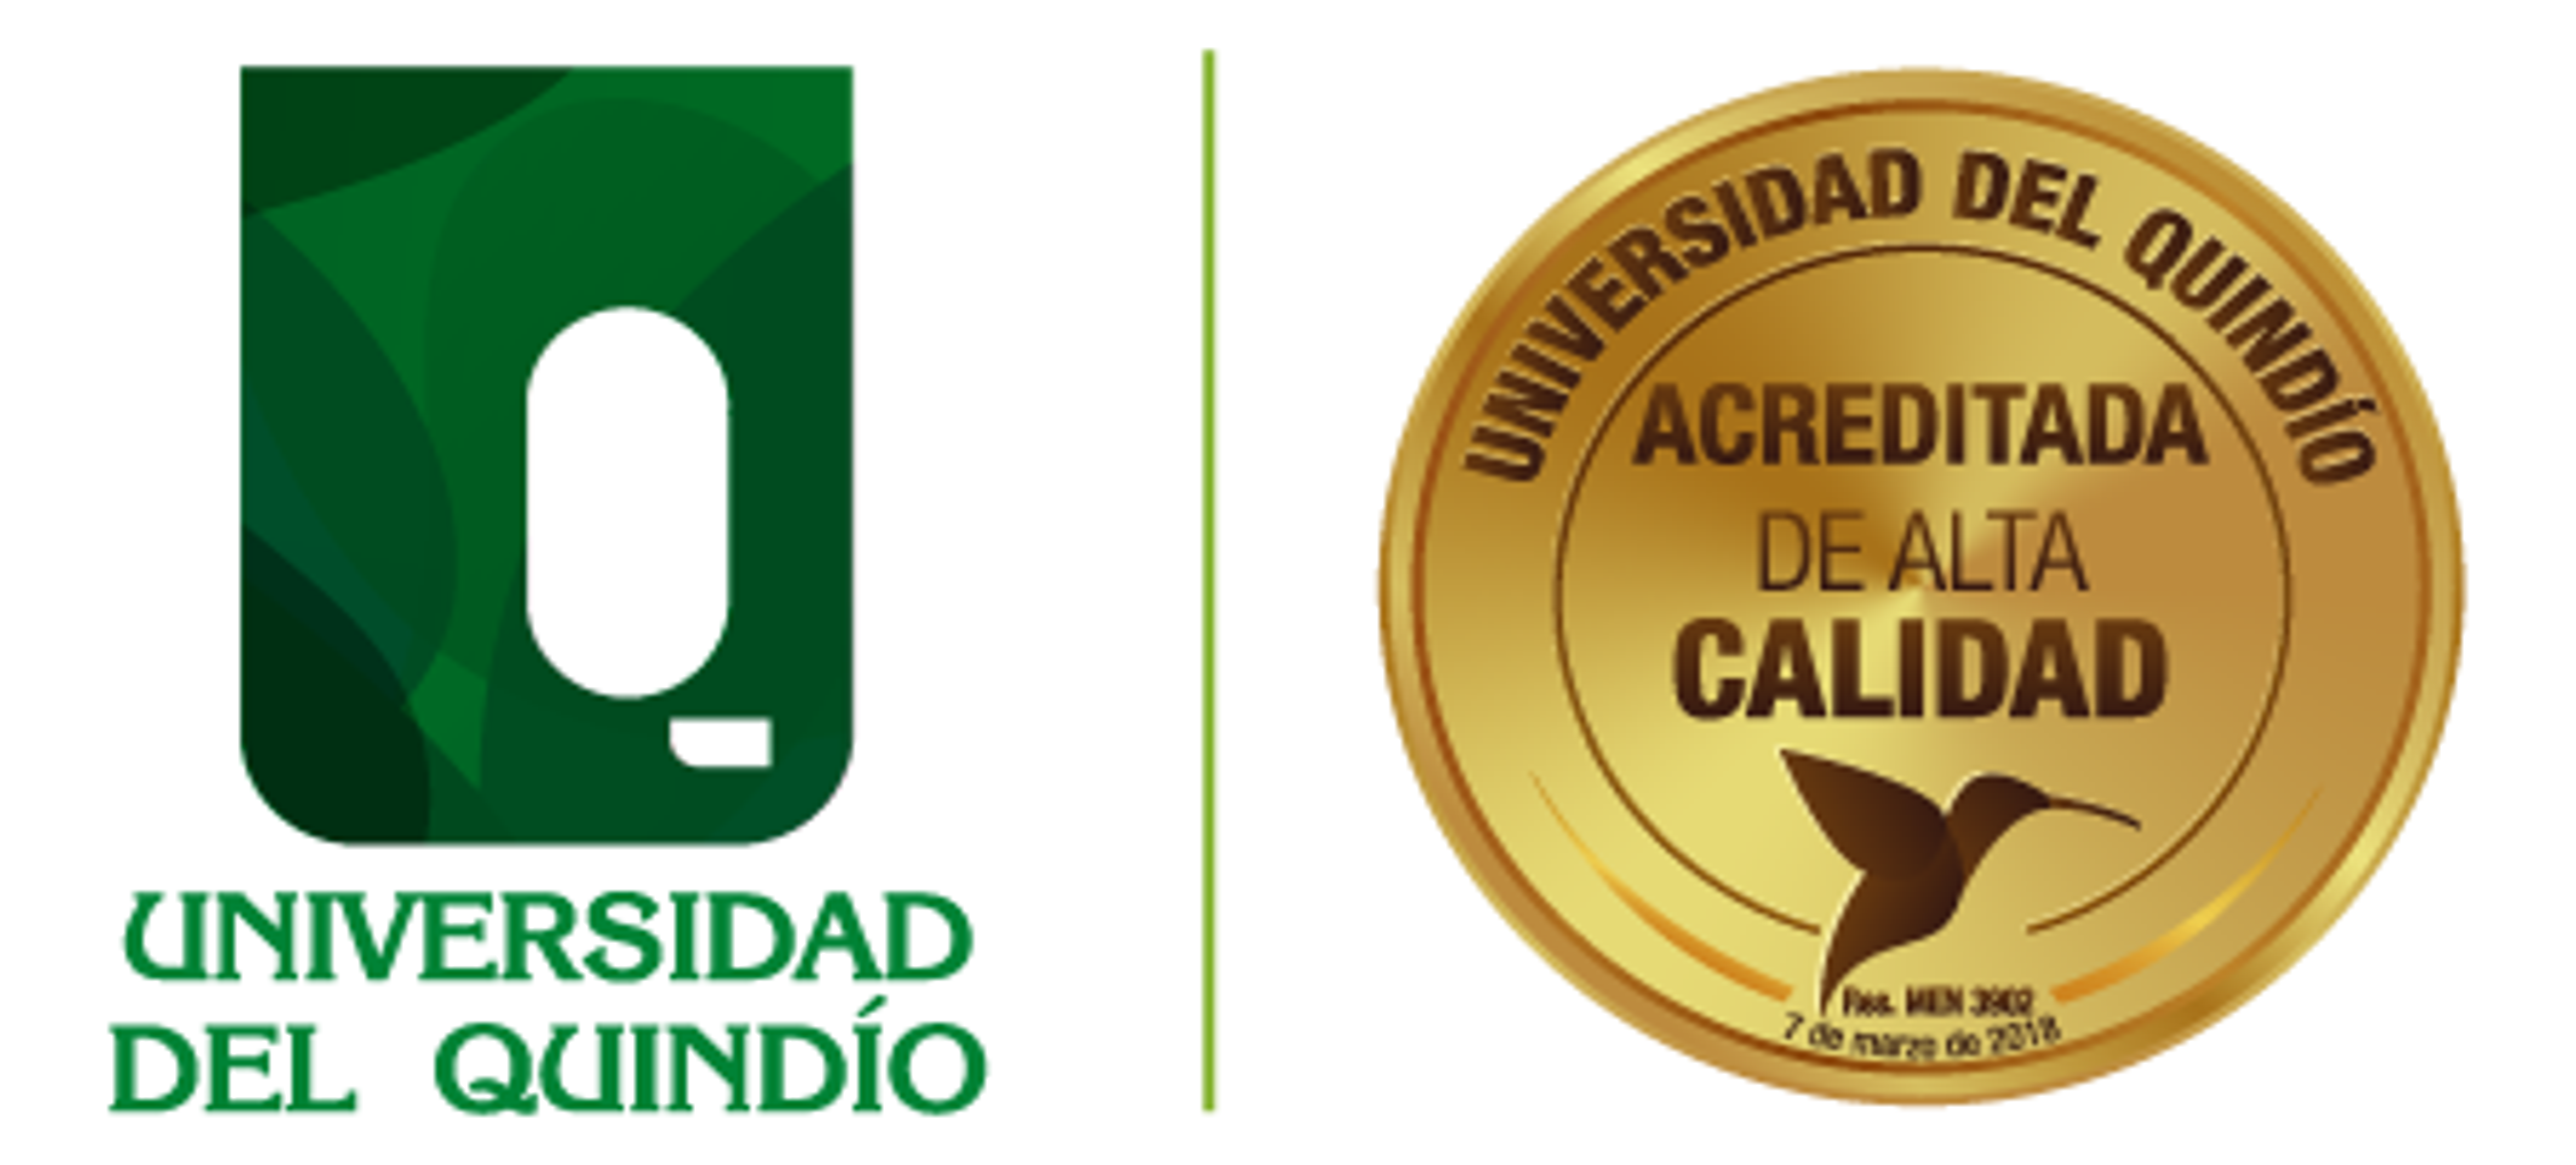 Universidad del Quindío Acreditada